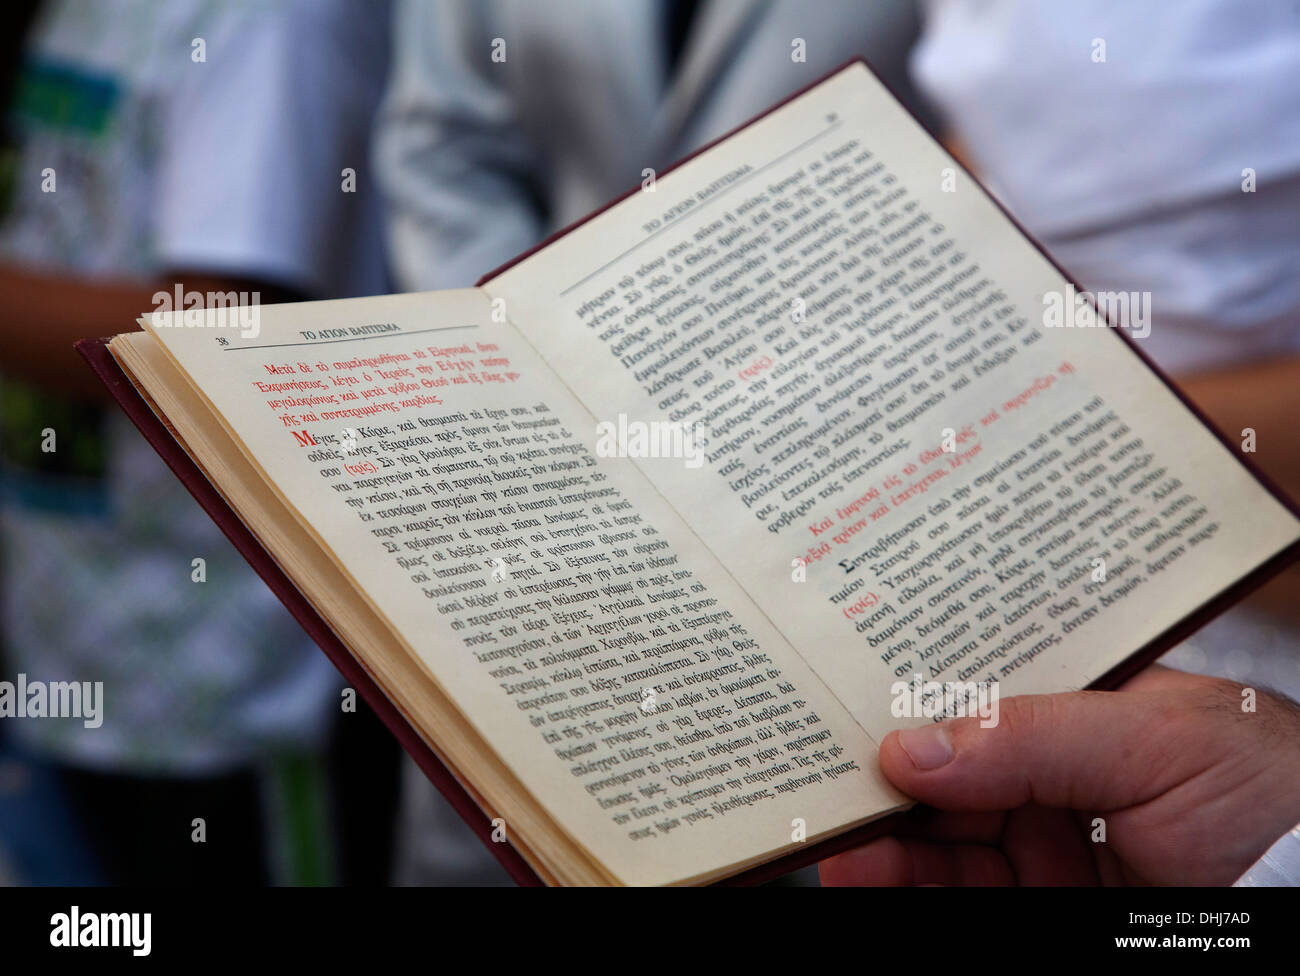 Christian booklet psalm ceremony orthodox wedding writings spiritual religion religious Orthodox belief read study priest belief - Stock Image